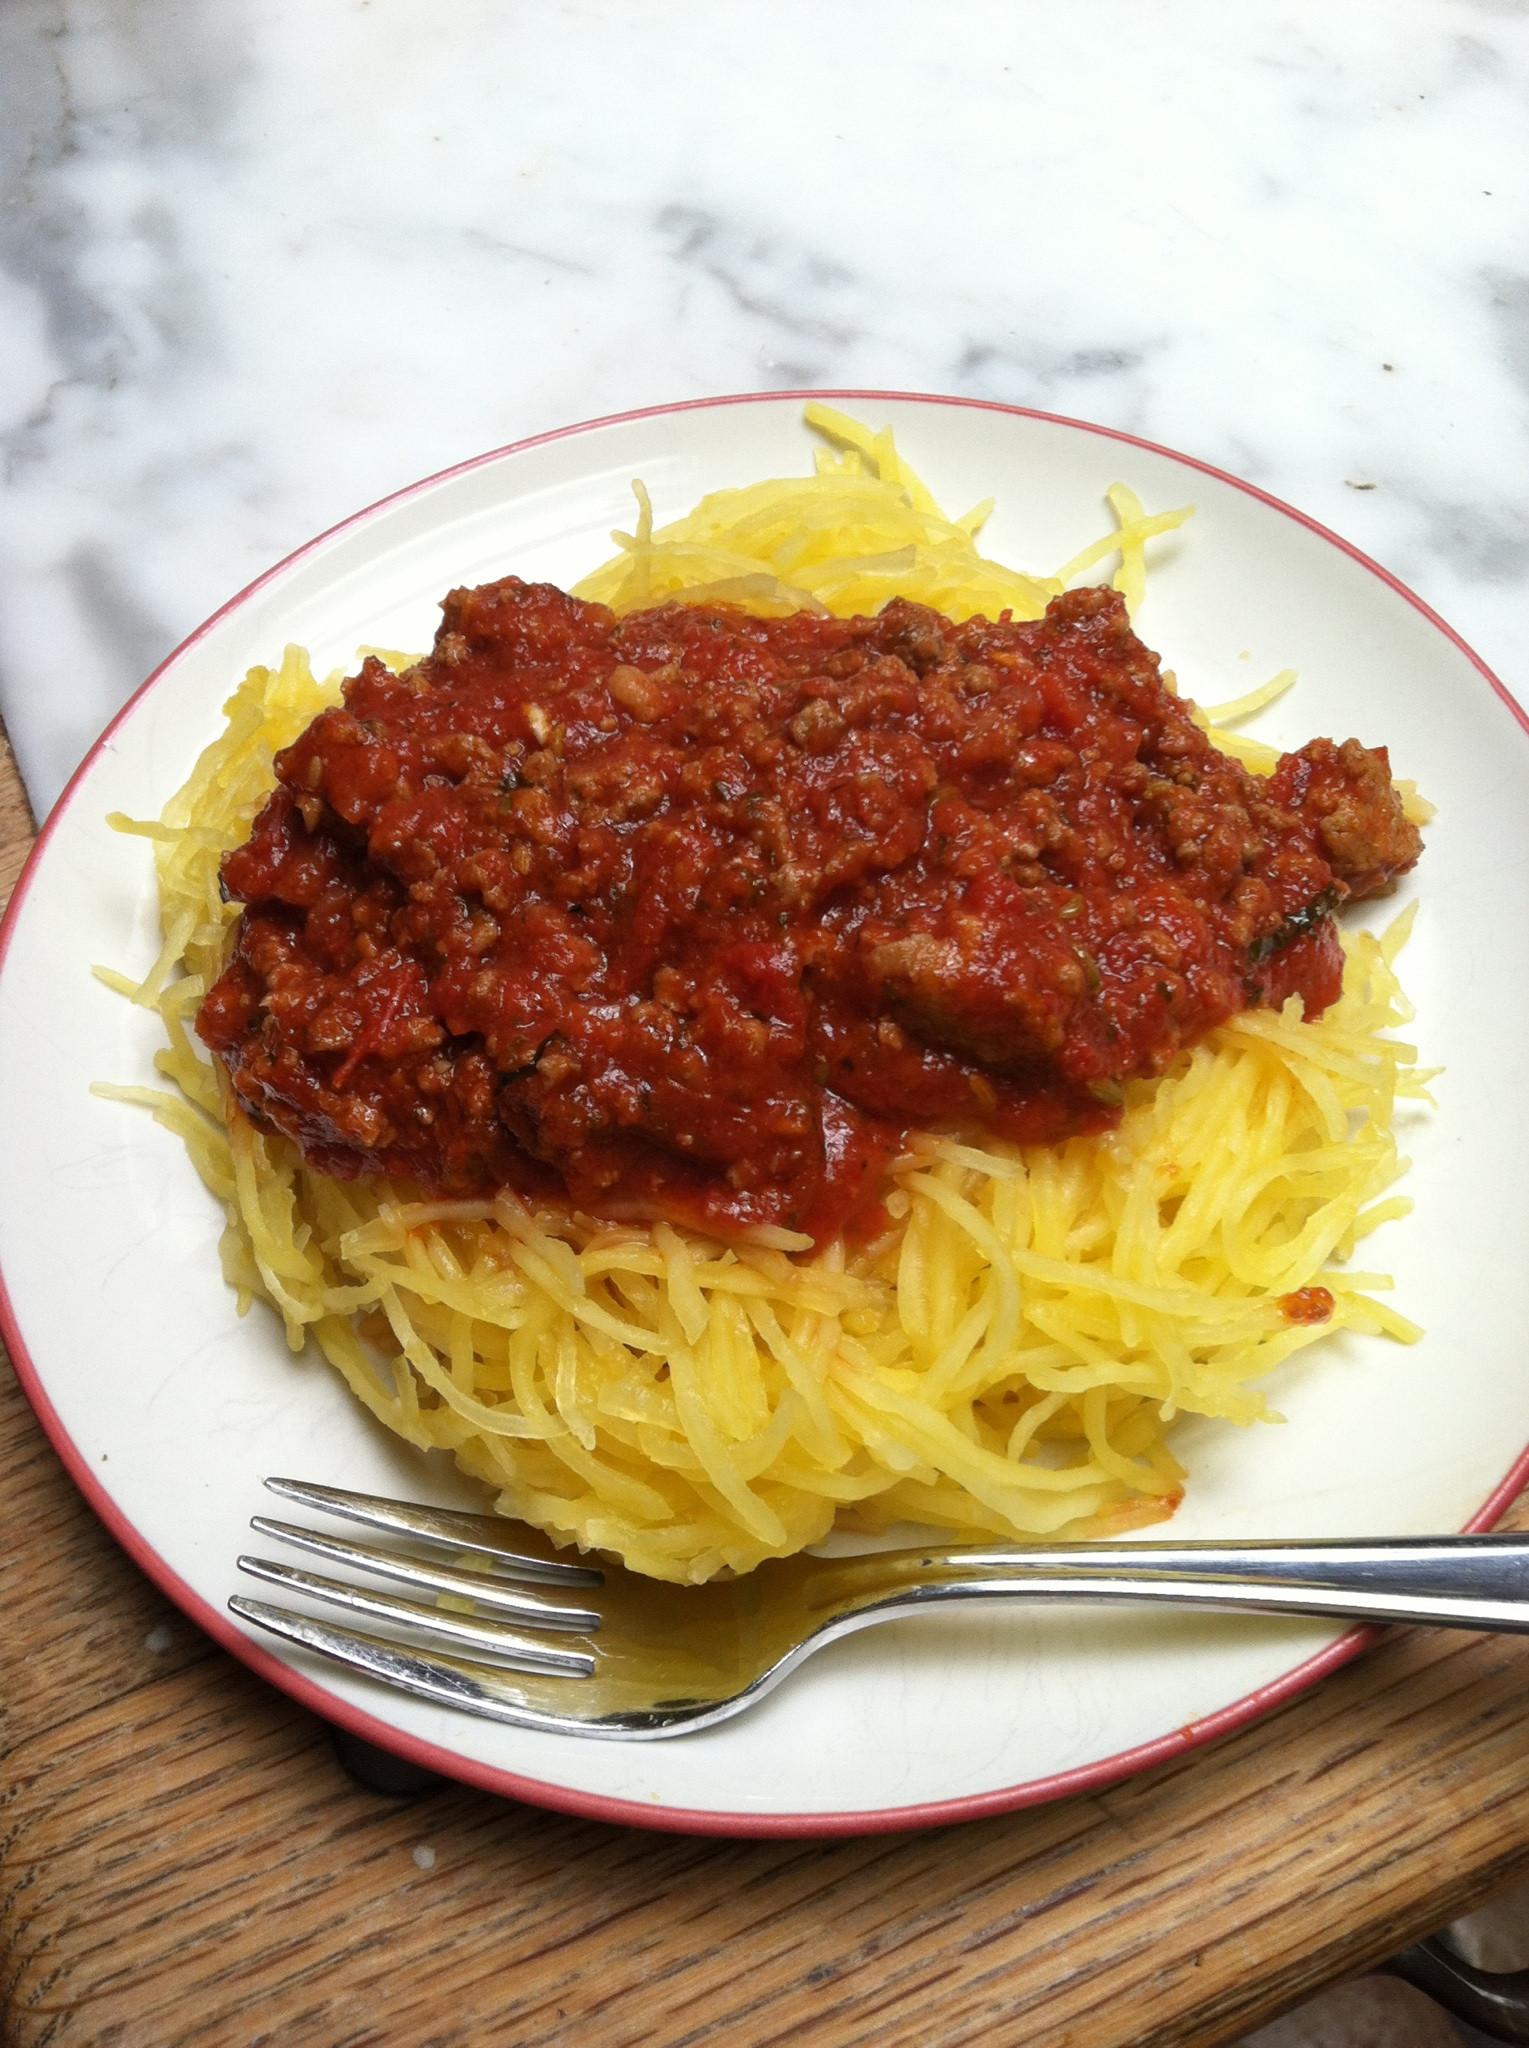 Low Carb Spaghetti Squash Recipes  Recipes Spaghetti Squash